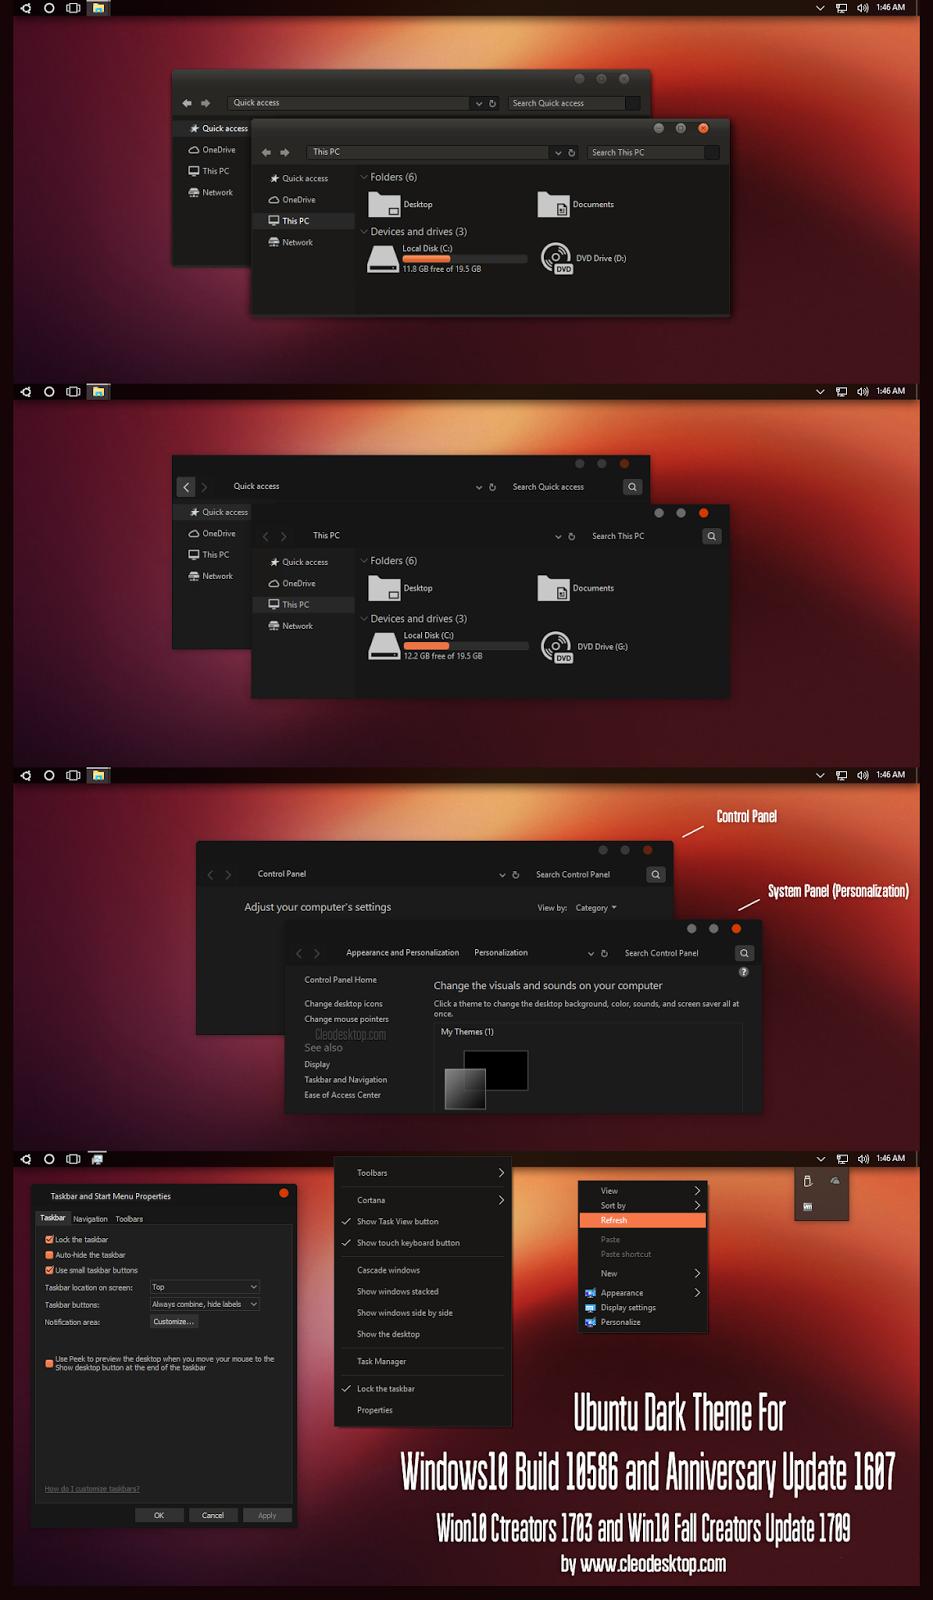 update windows 10 1607 to 1709